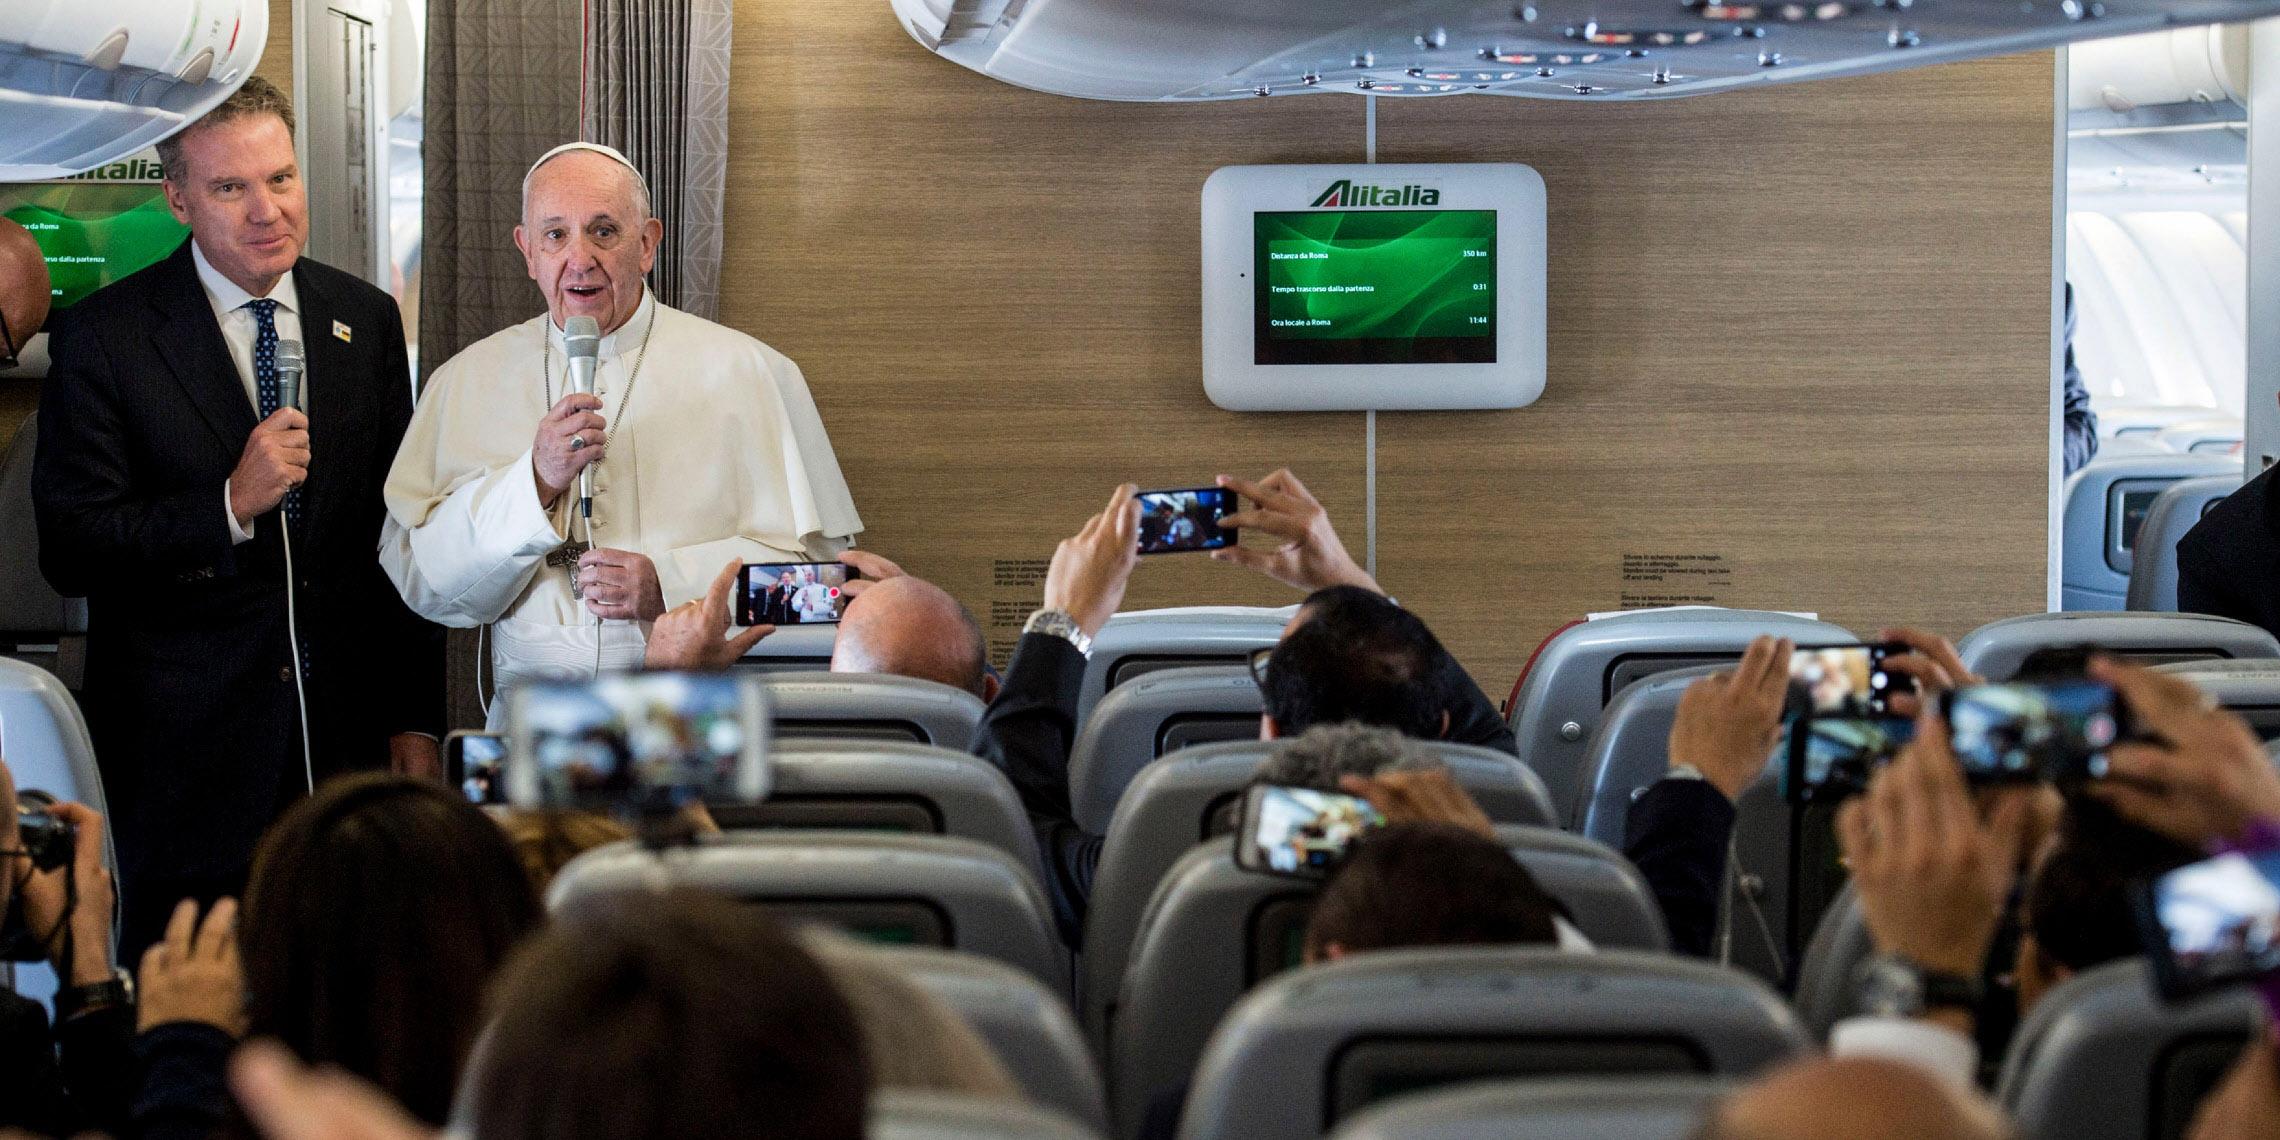 POPE PLANE